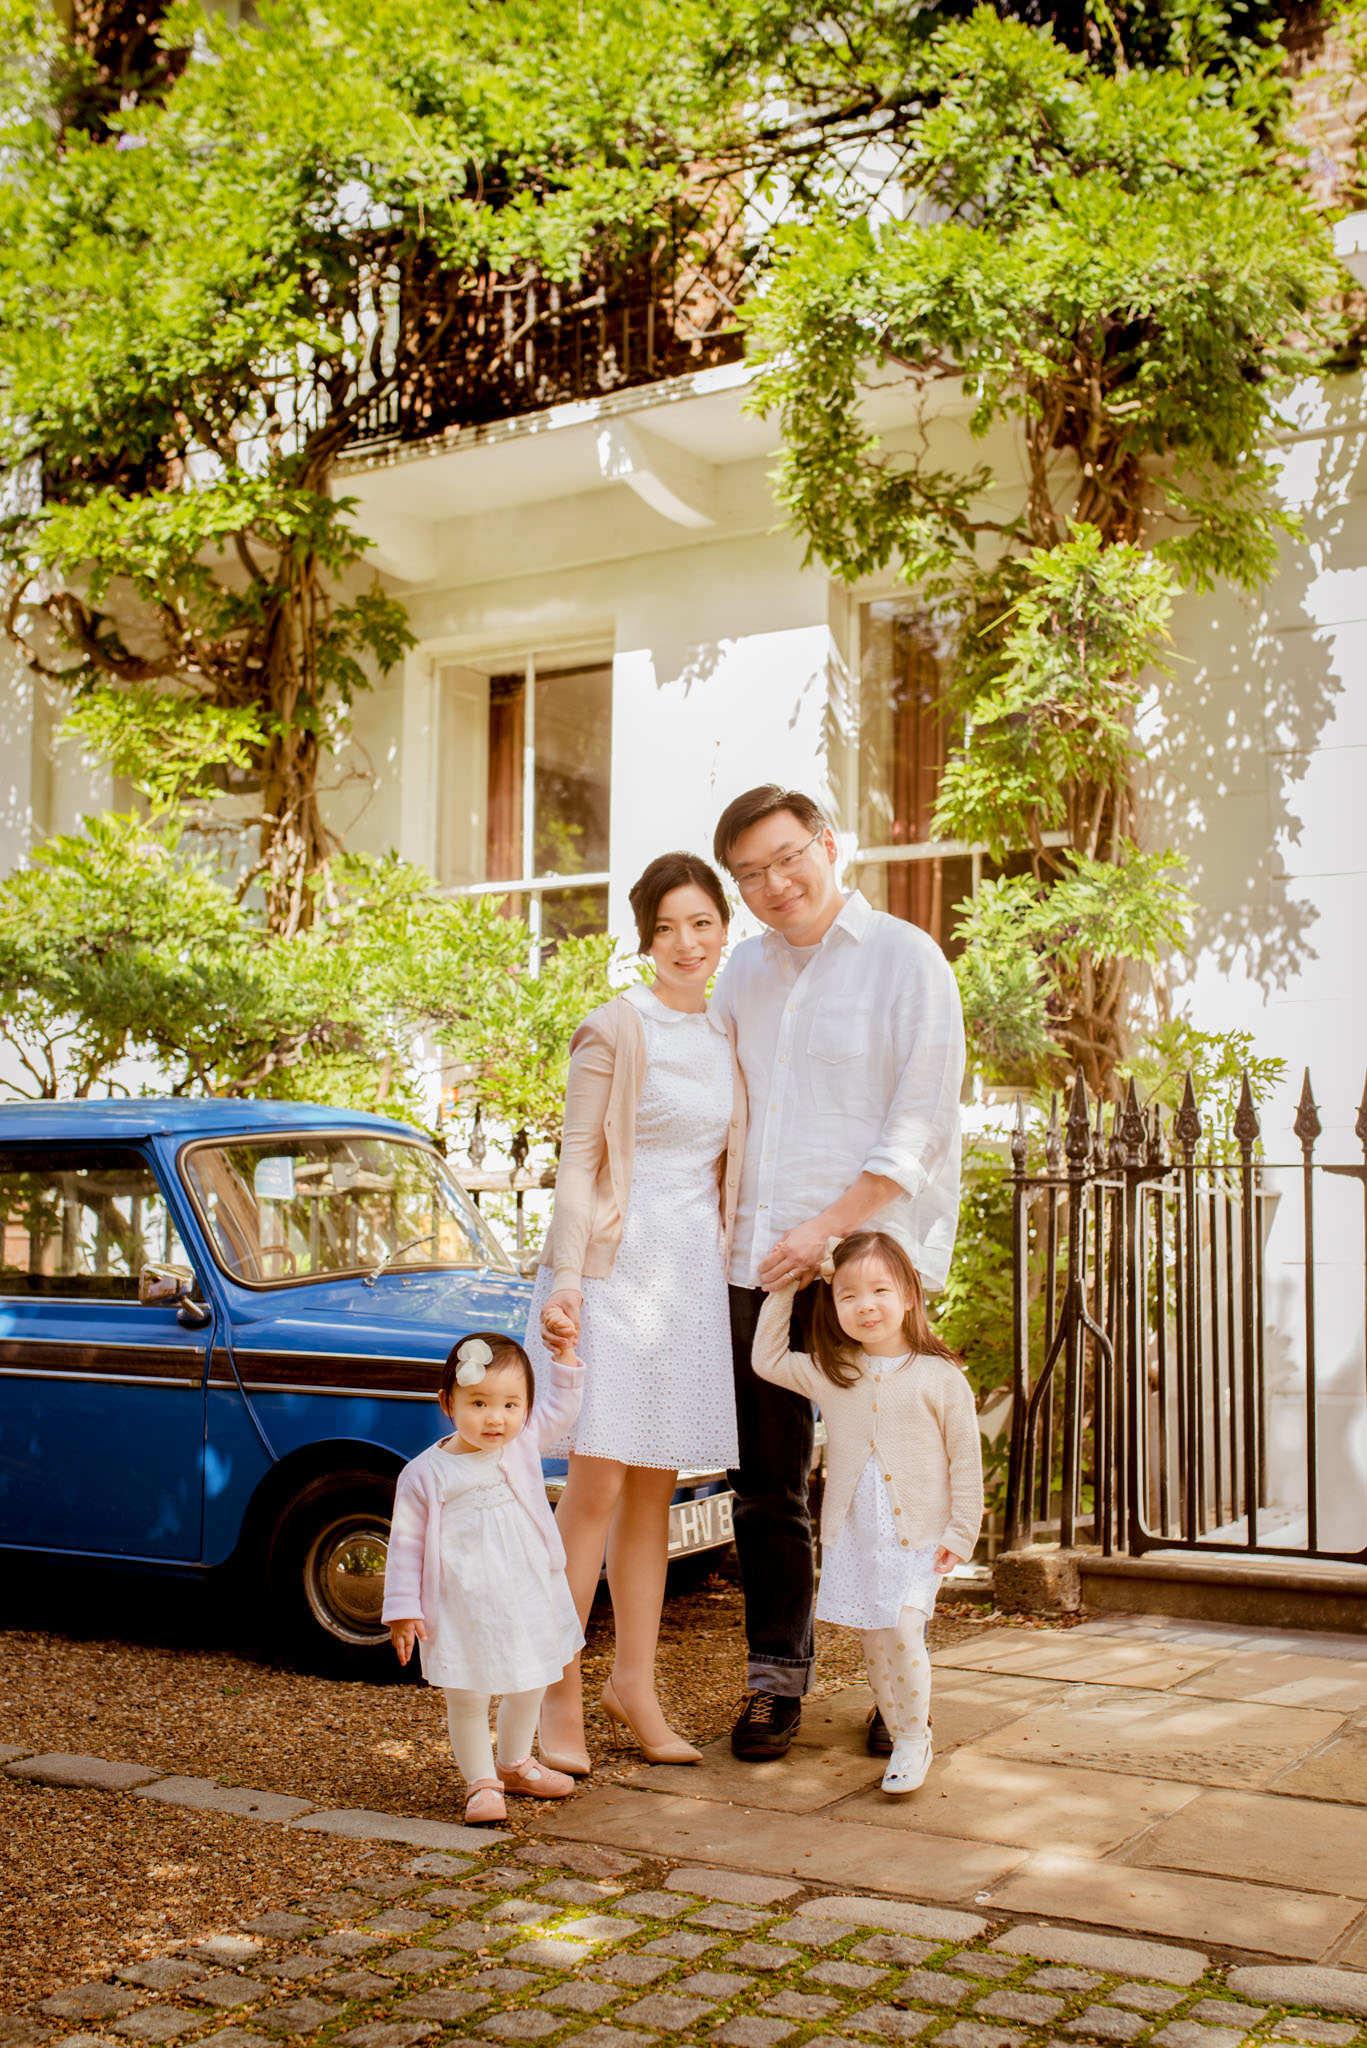 Family portrait photographer Chelsea